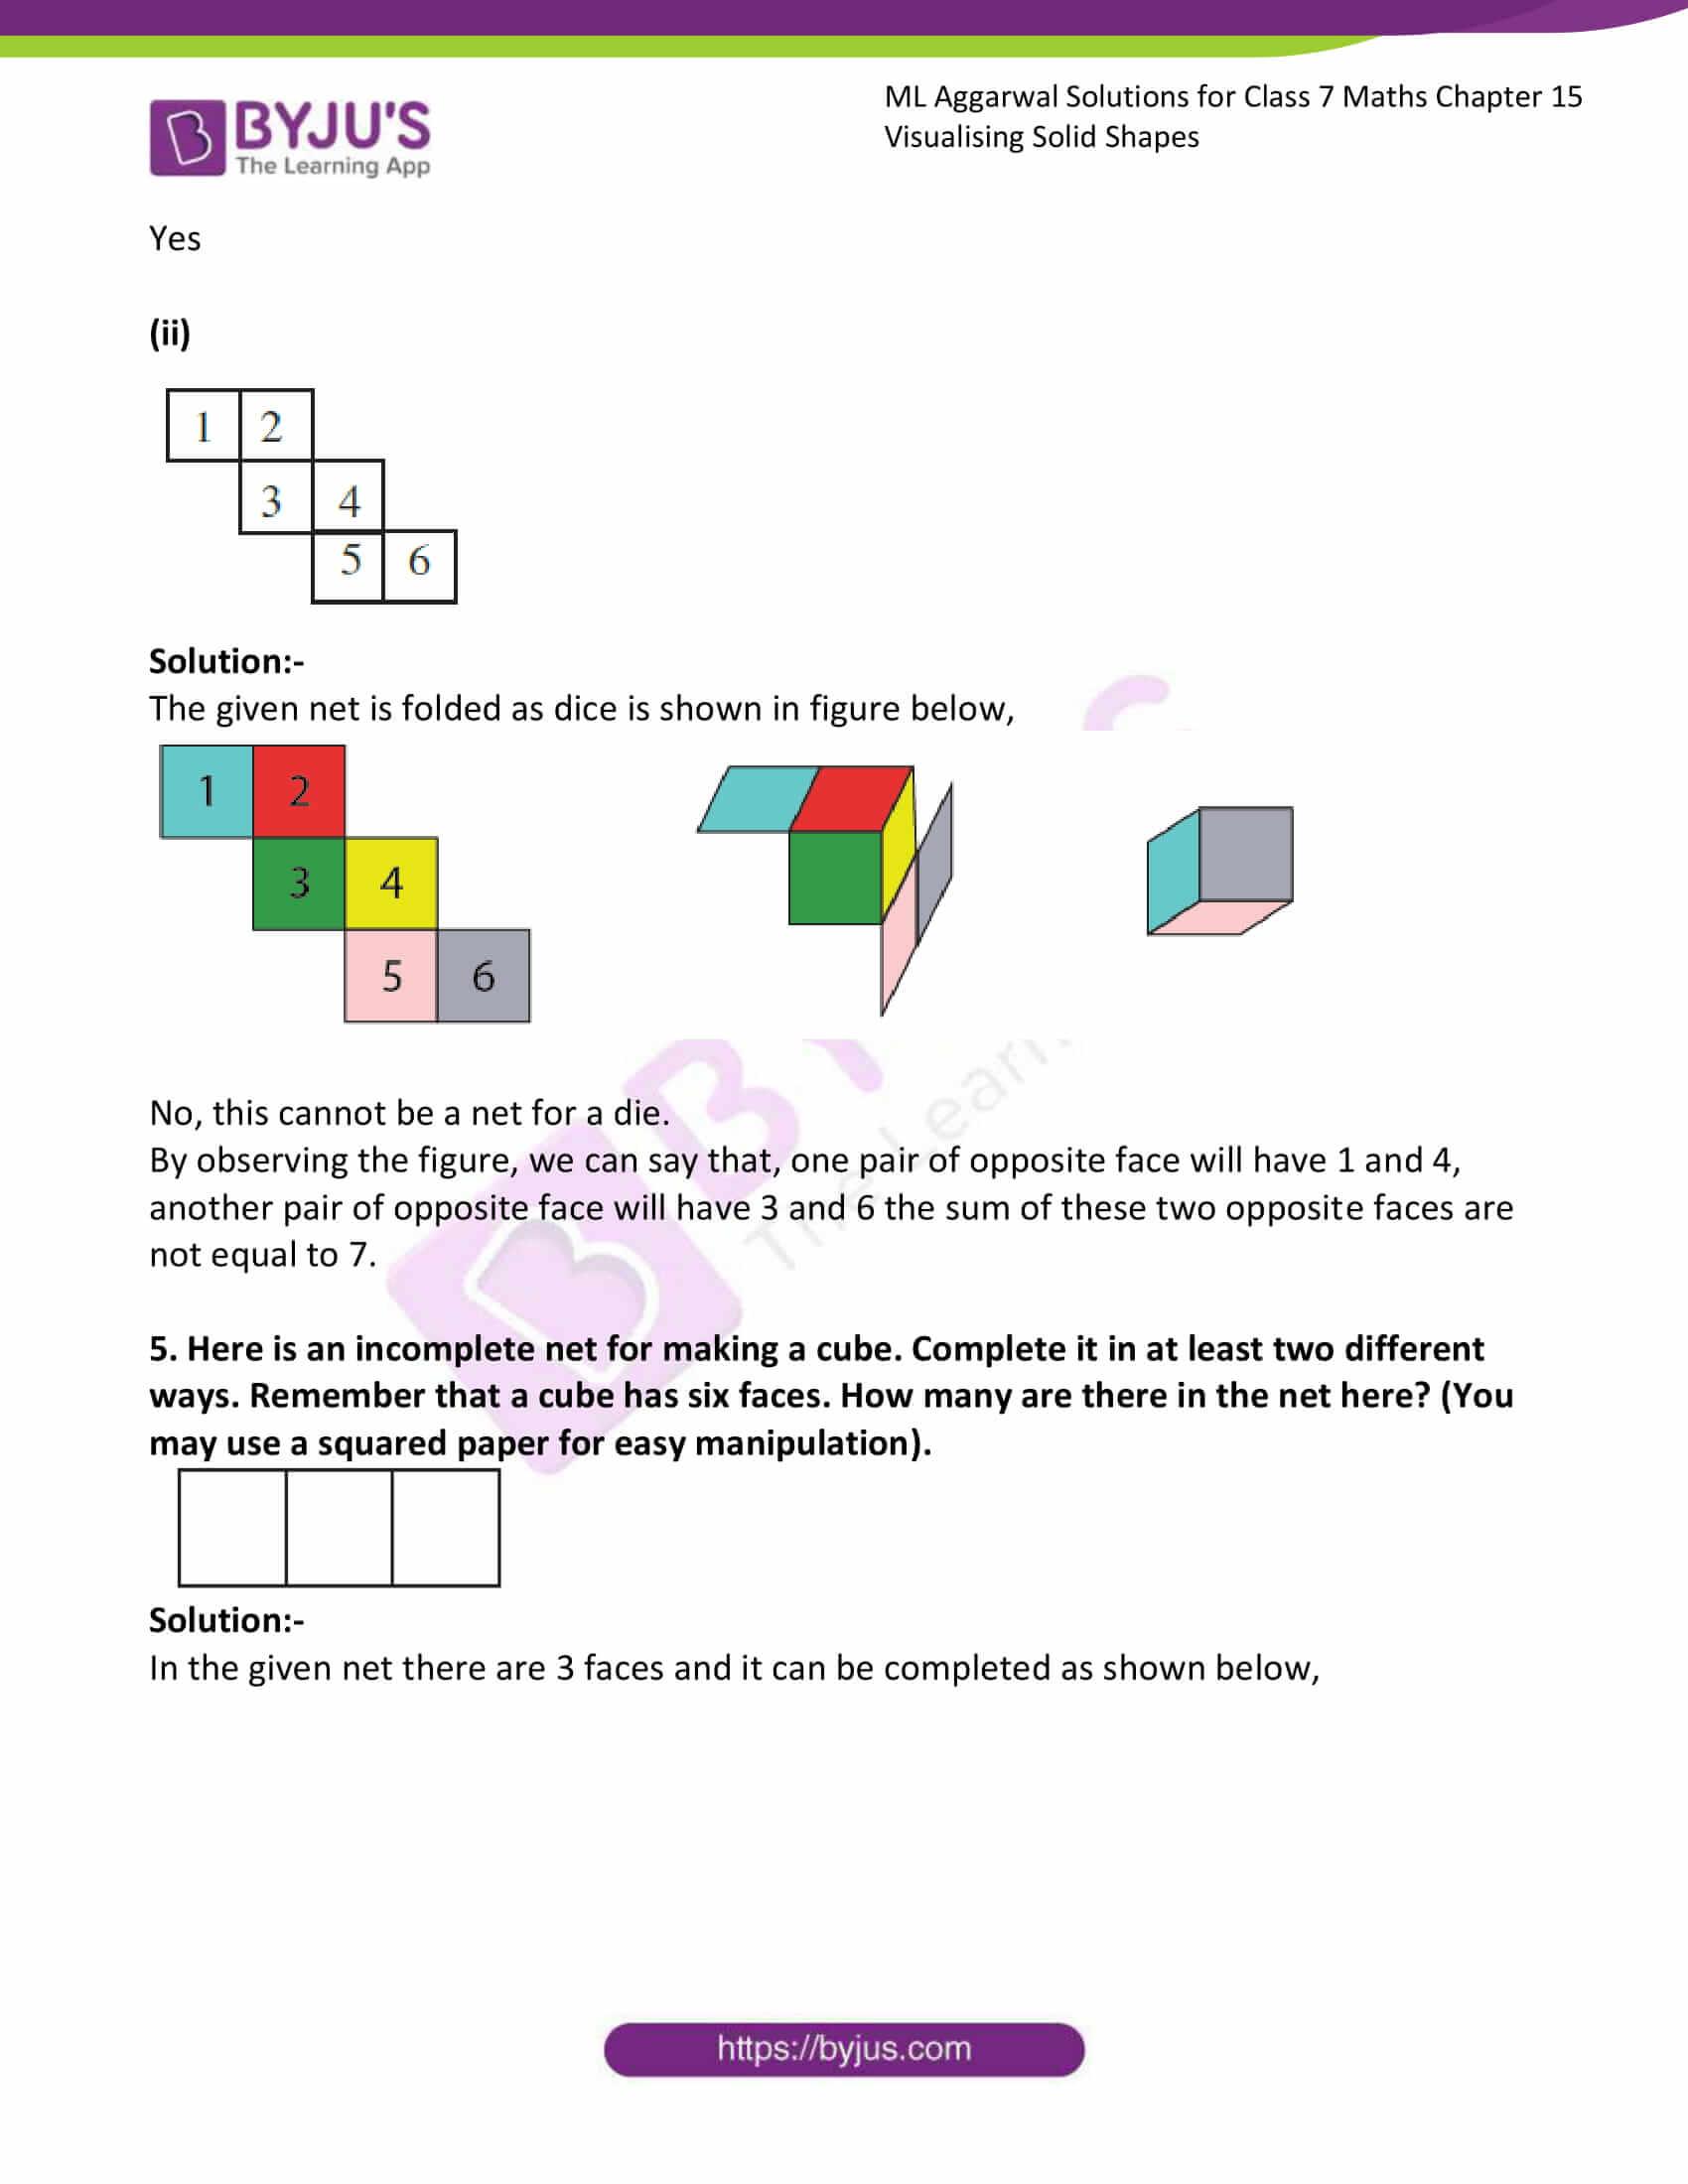 ml aggarwal sol class 7 maths chapter 15 7